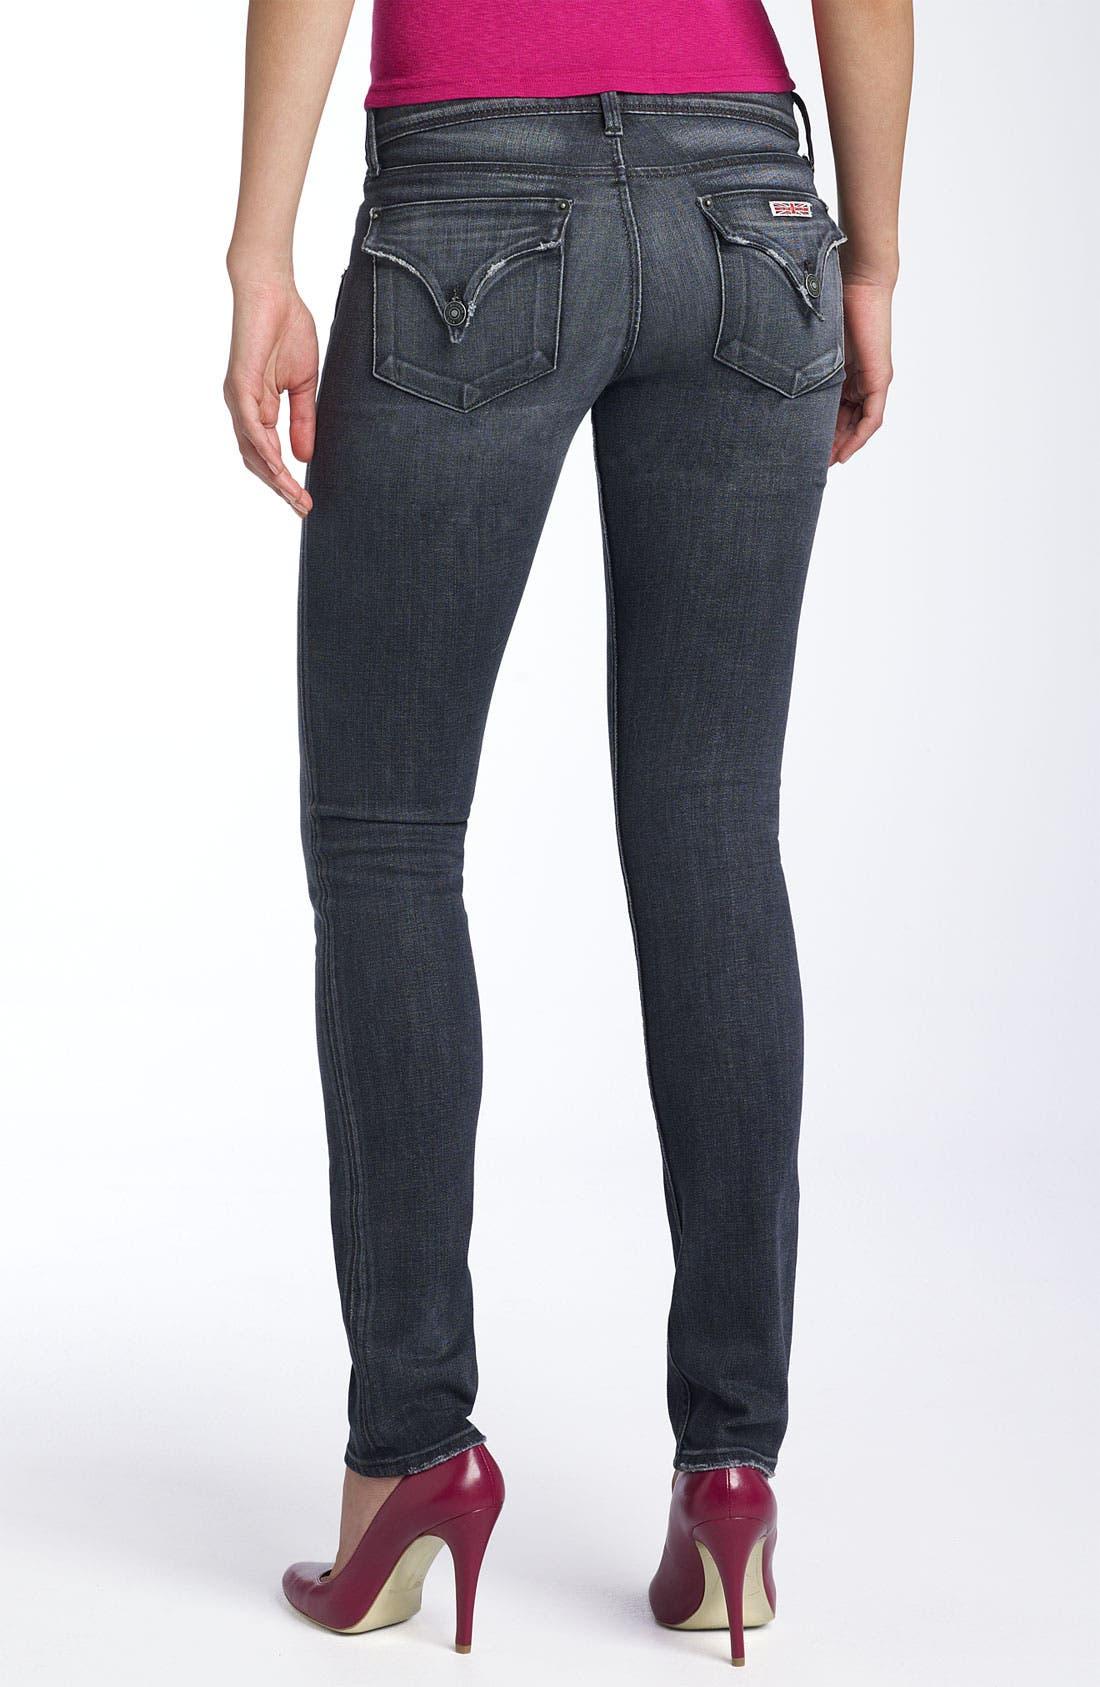 'Collin' Skinny Jeans,                             Alternate thumbnail 2, color,                             017